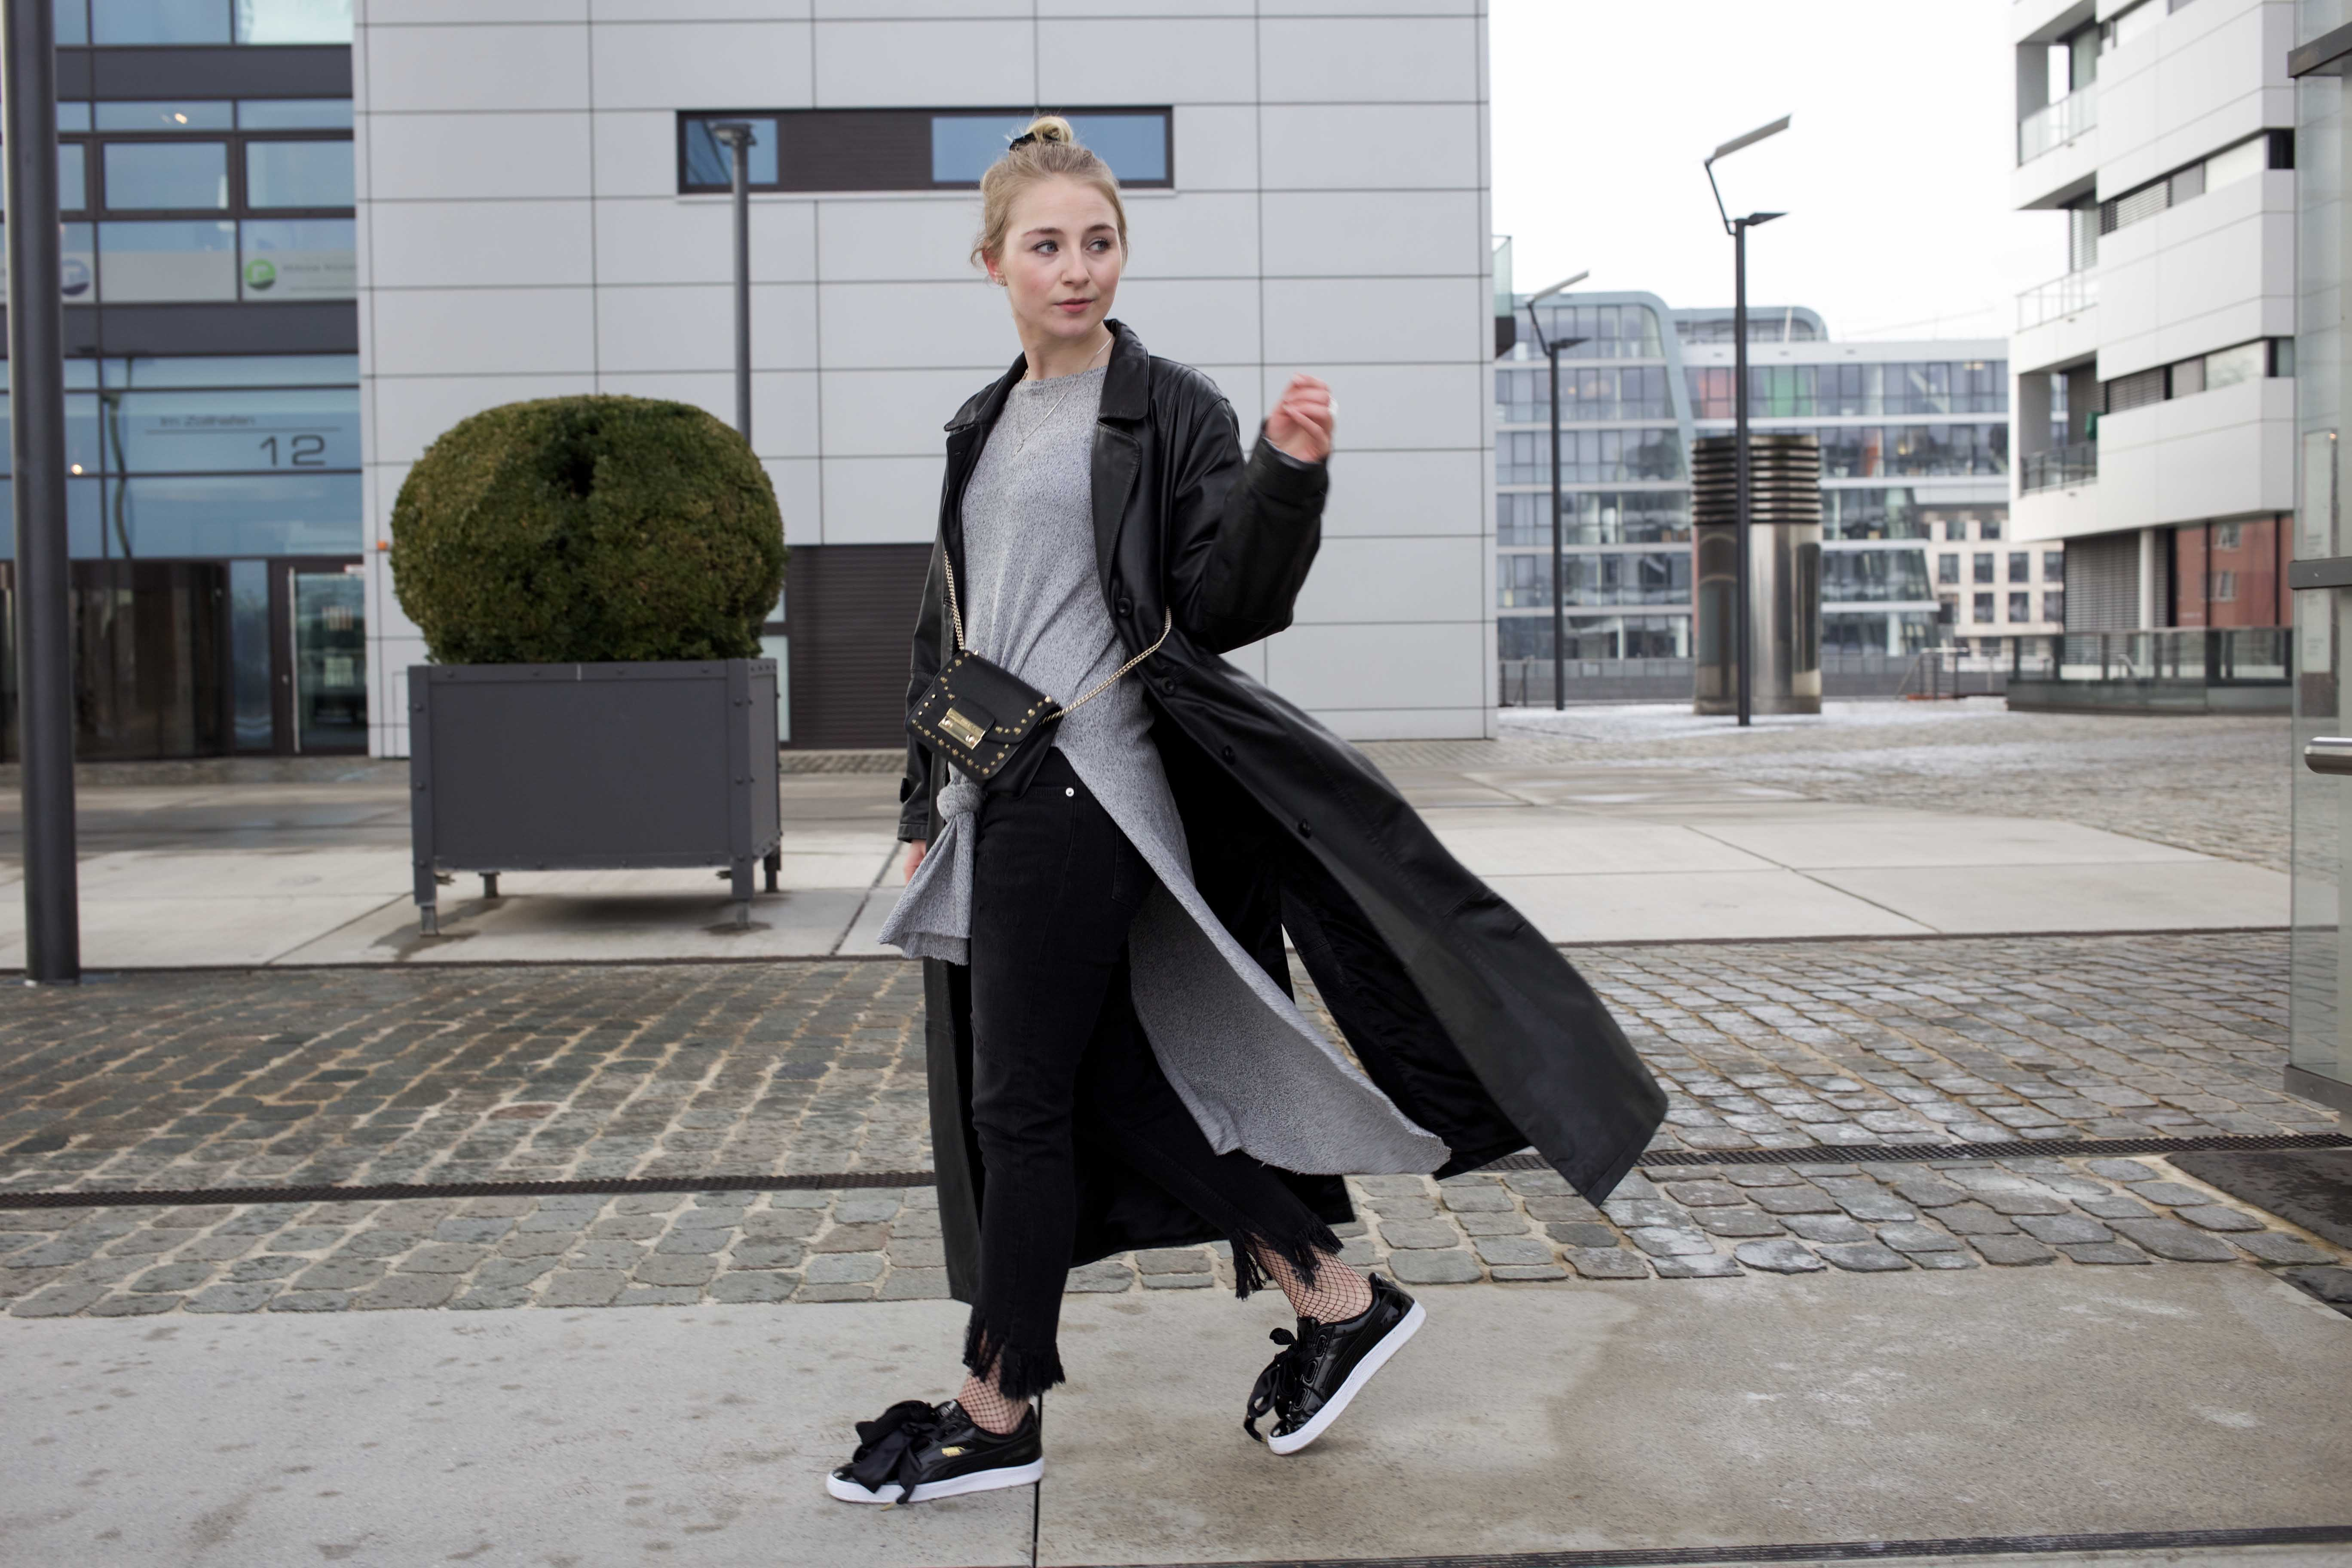 Netzstrumpfhose-kombinieren-Trend-Outfit-Fashionblog-PUMA-Basket-Ledermante_9492